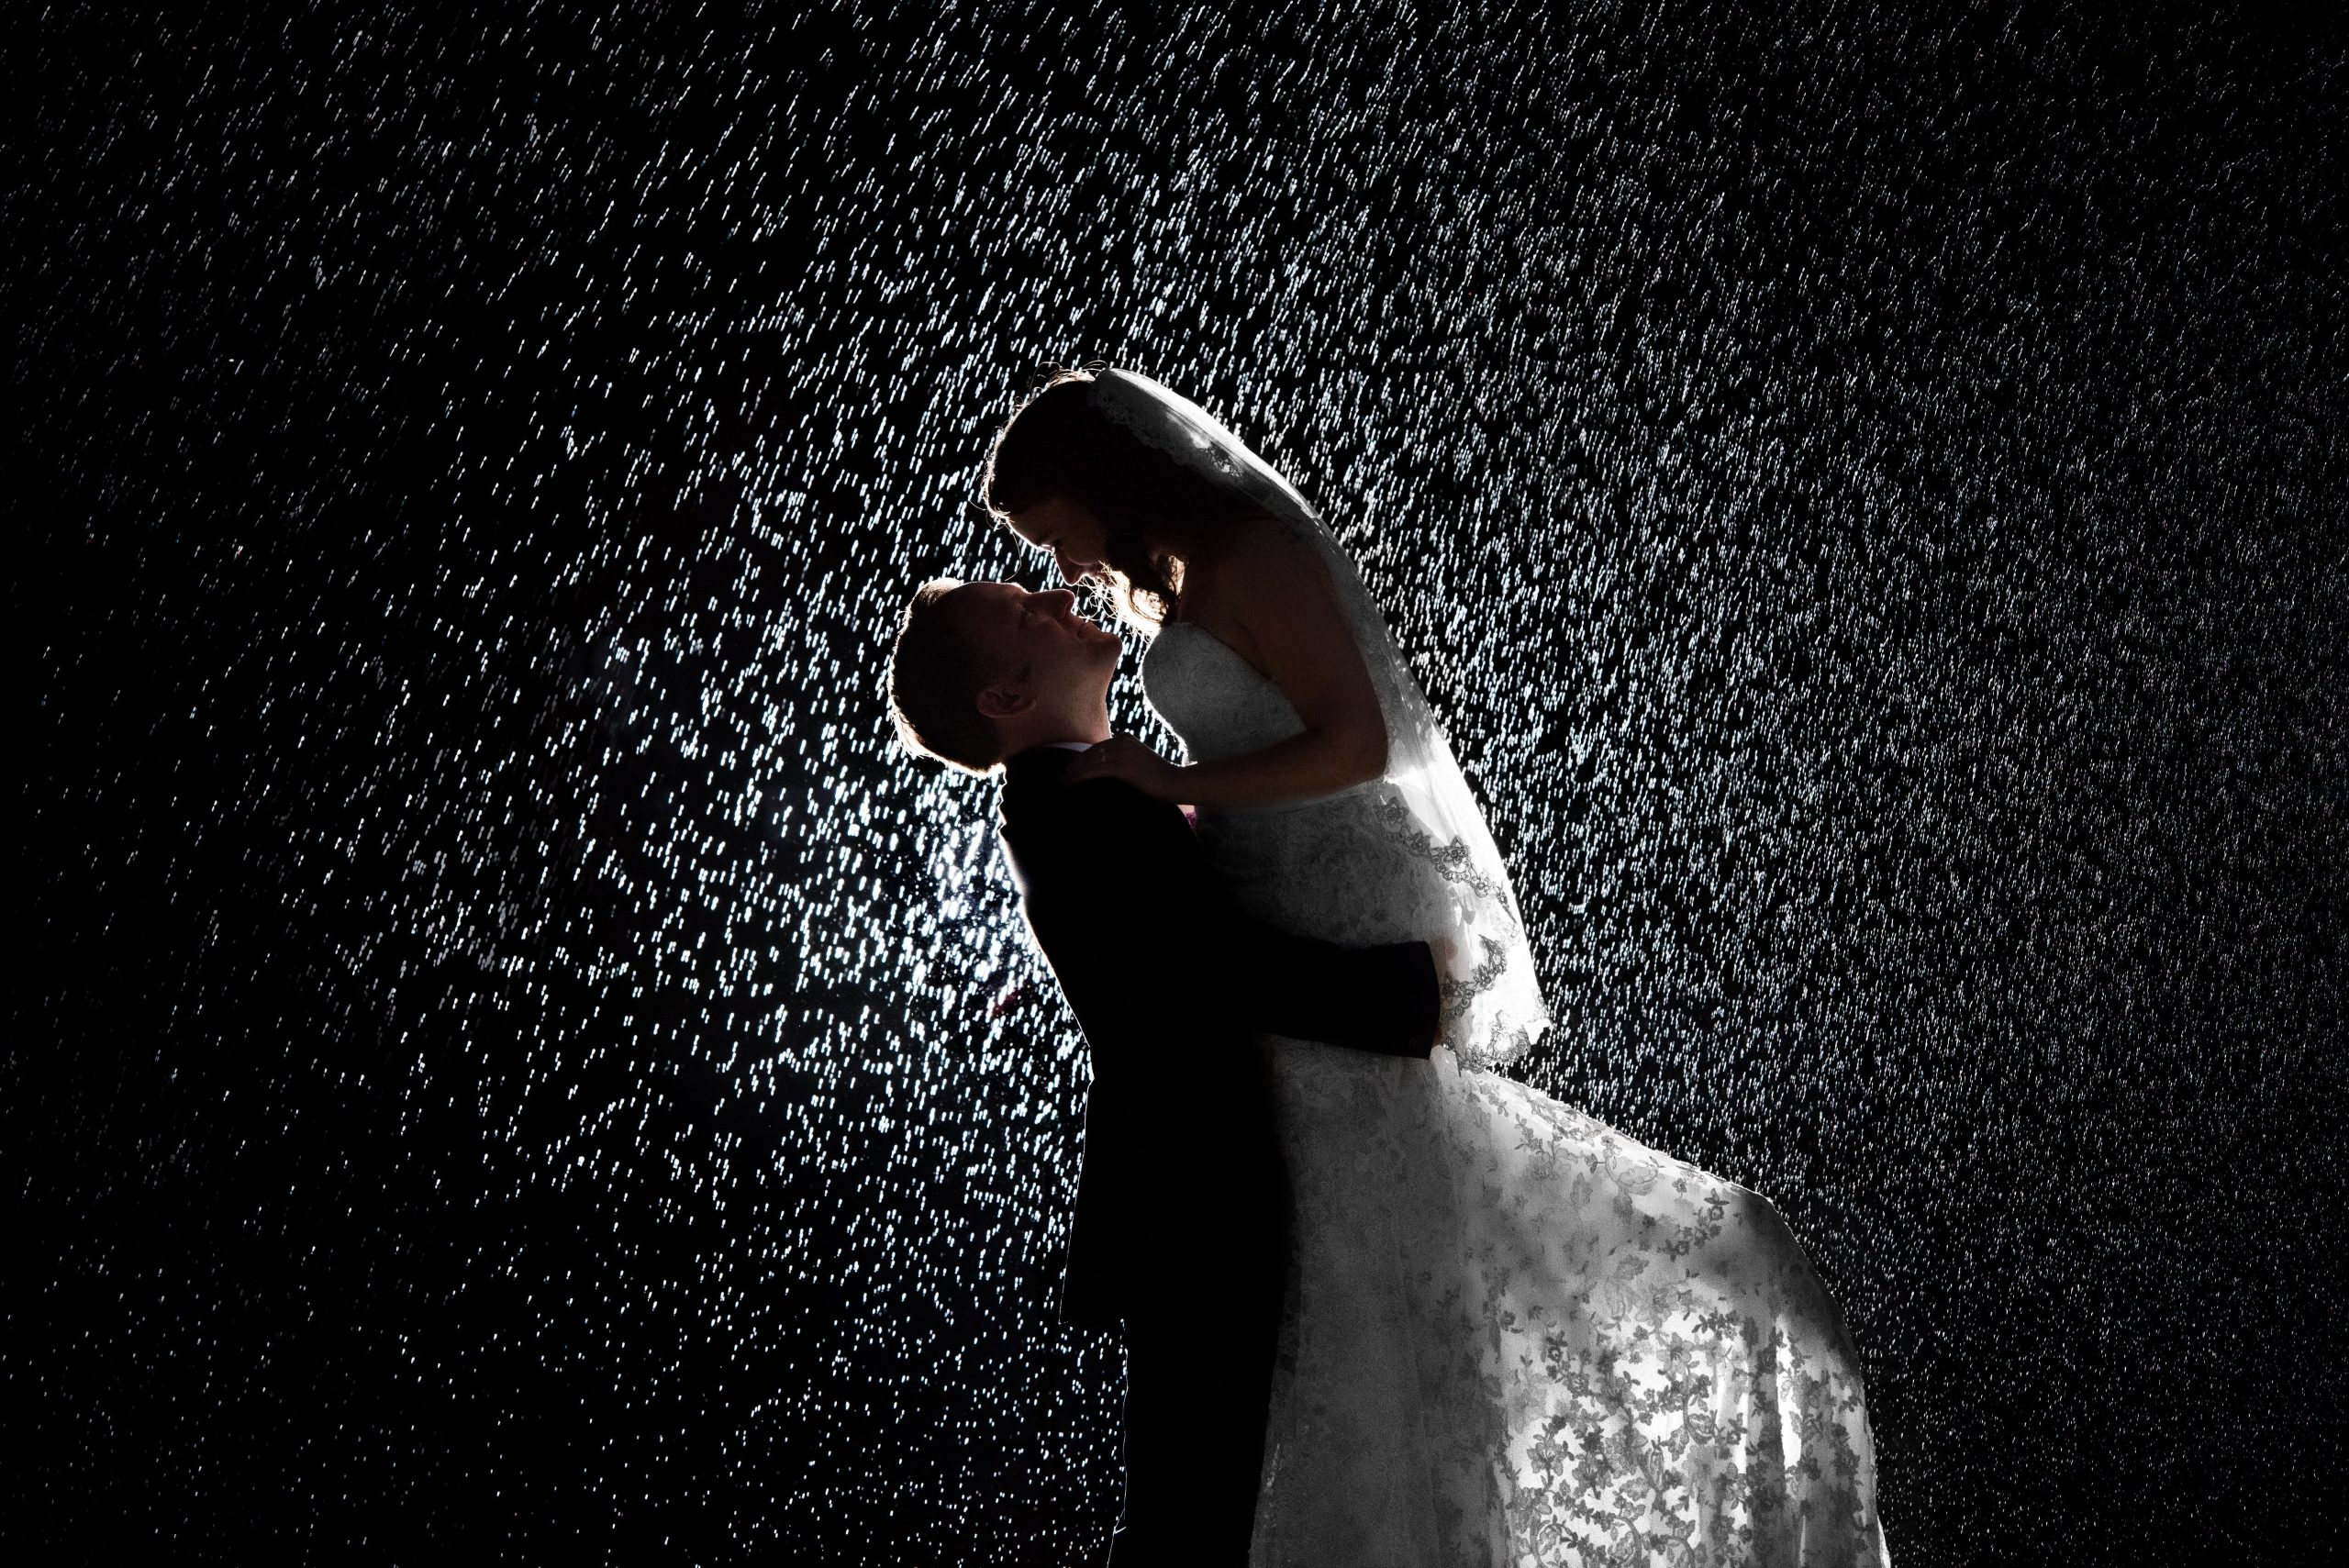 Wedding elopement photography fine art portrait photographer water bear photography studio Gainesville Florida USA